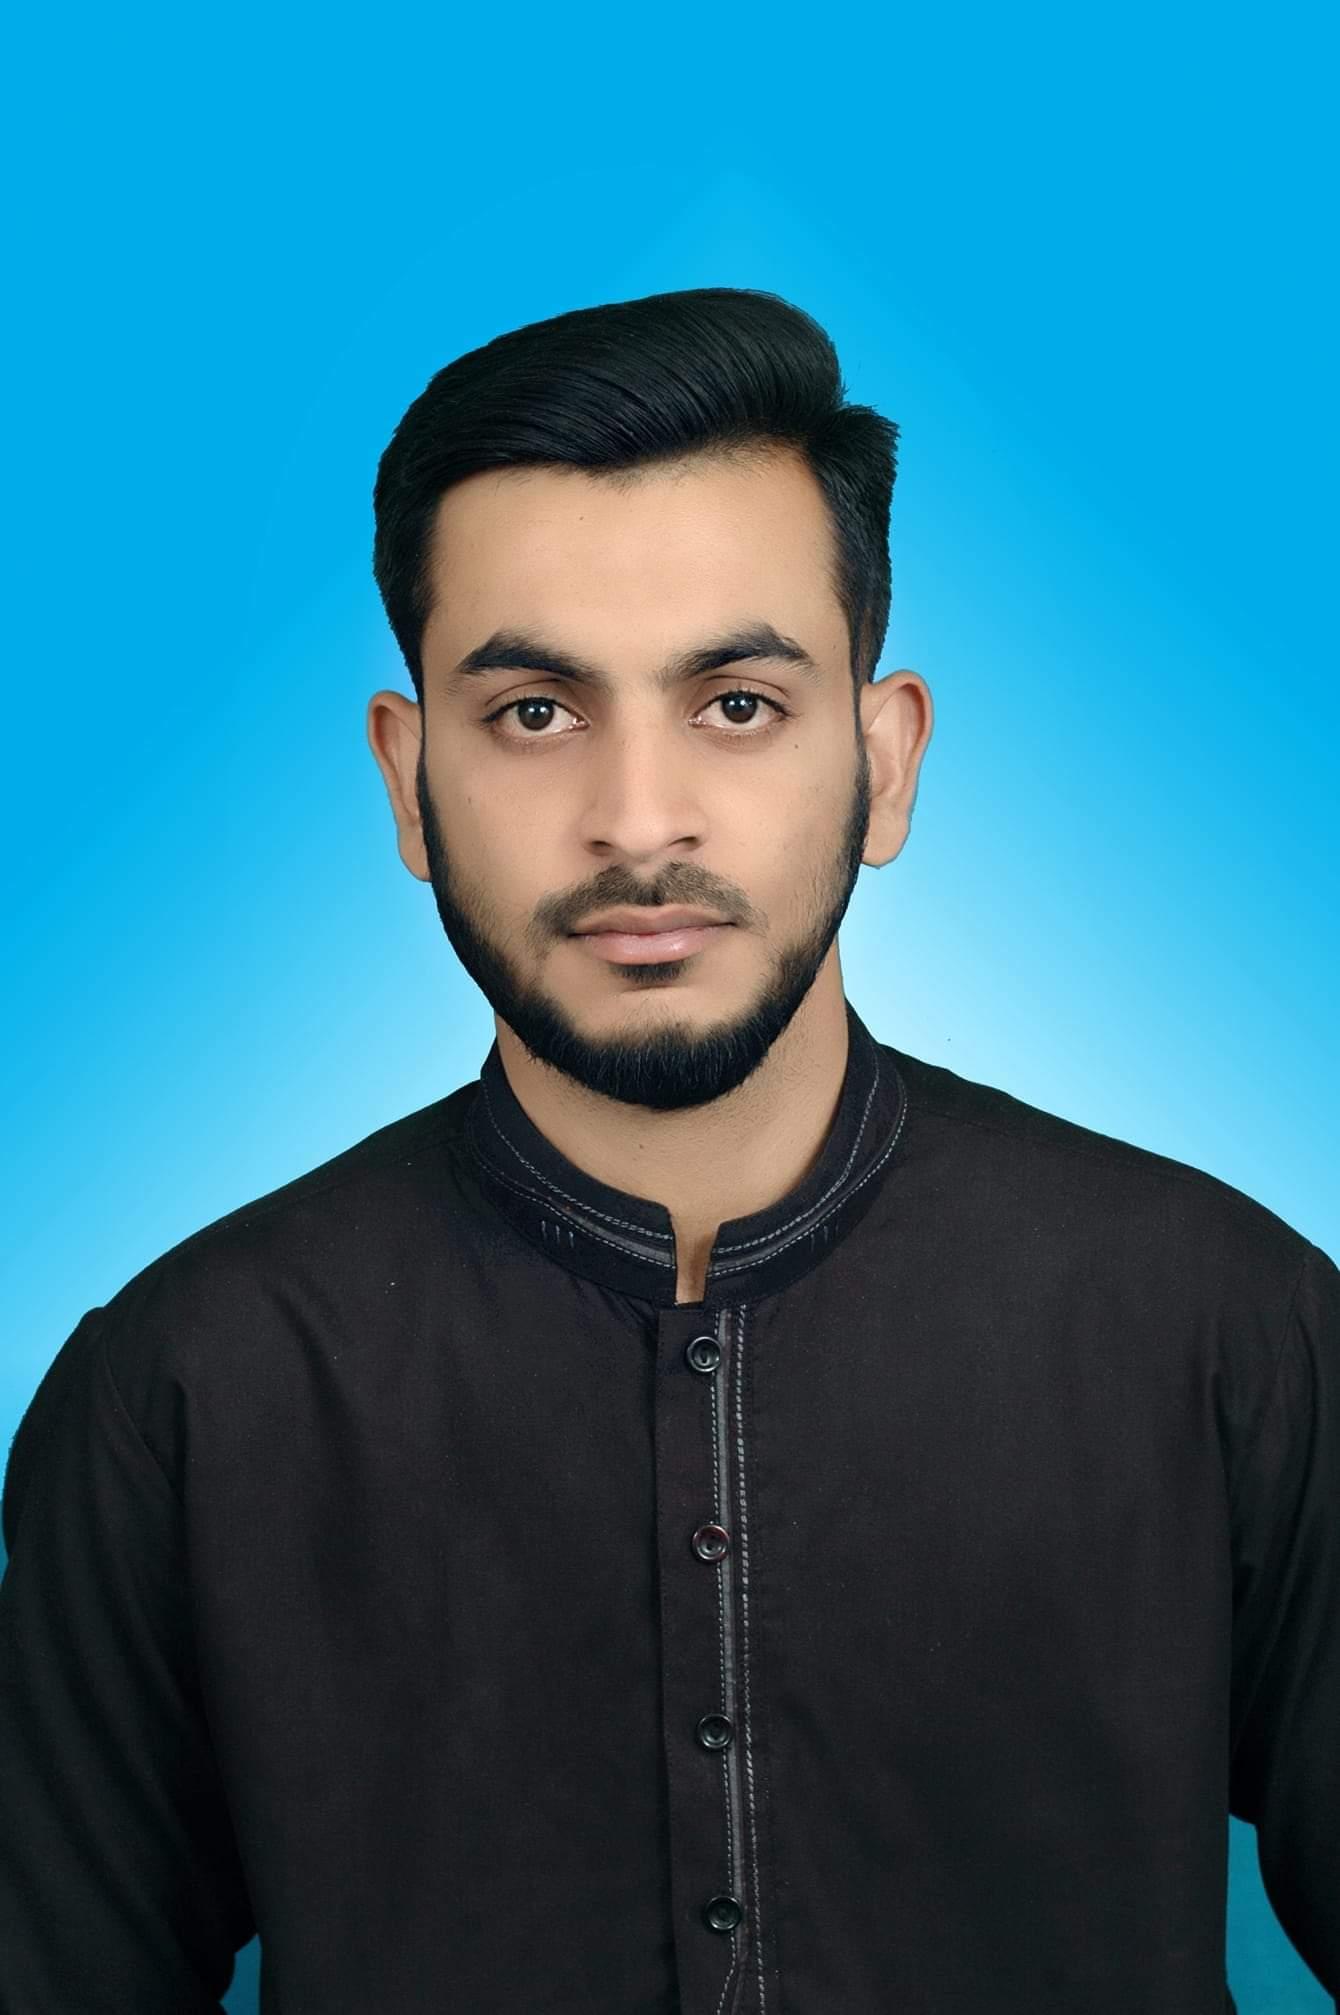 Shakar Kamran Illustrator, Photoshop, Word, Business Plans, Excel